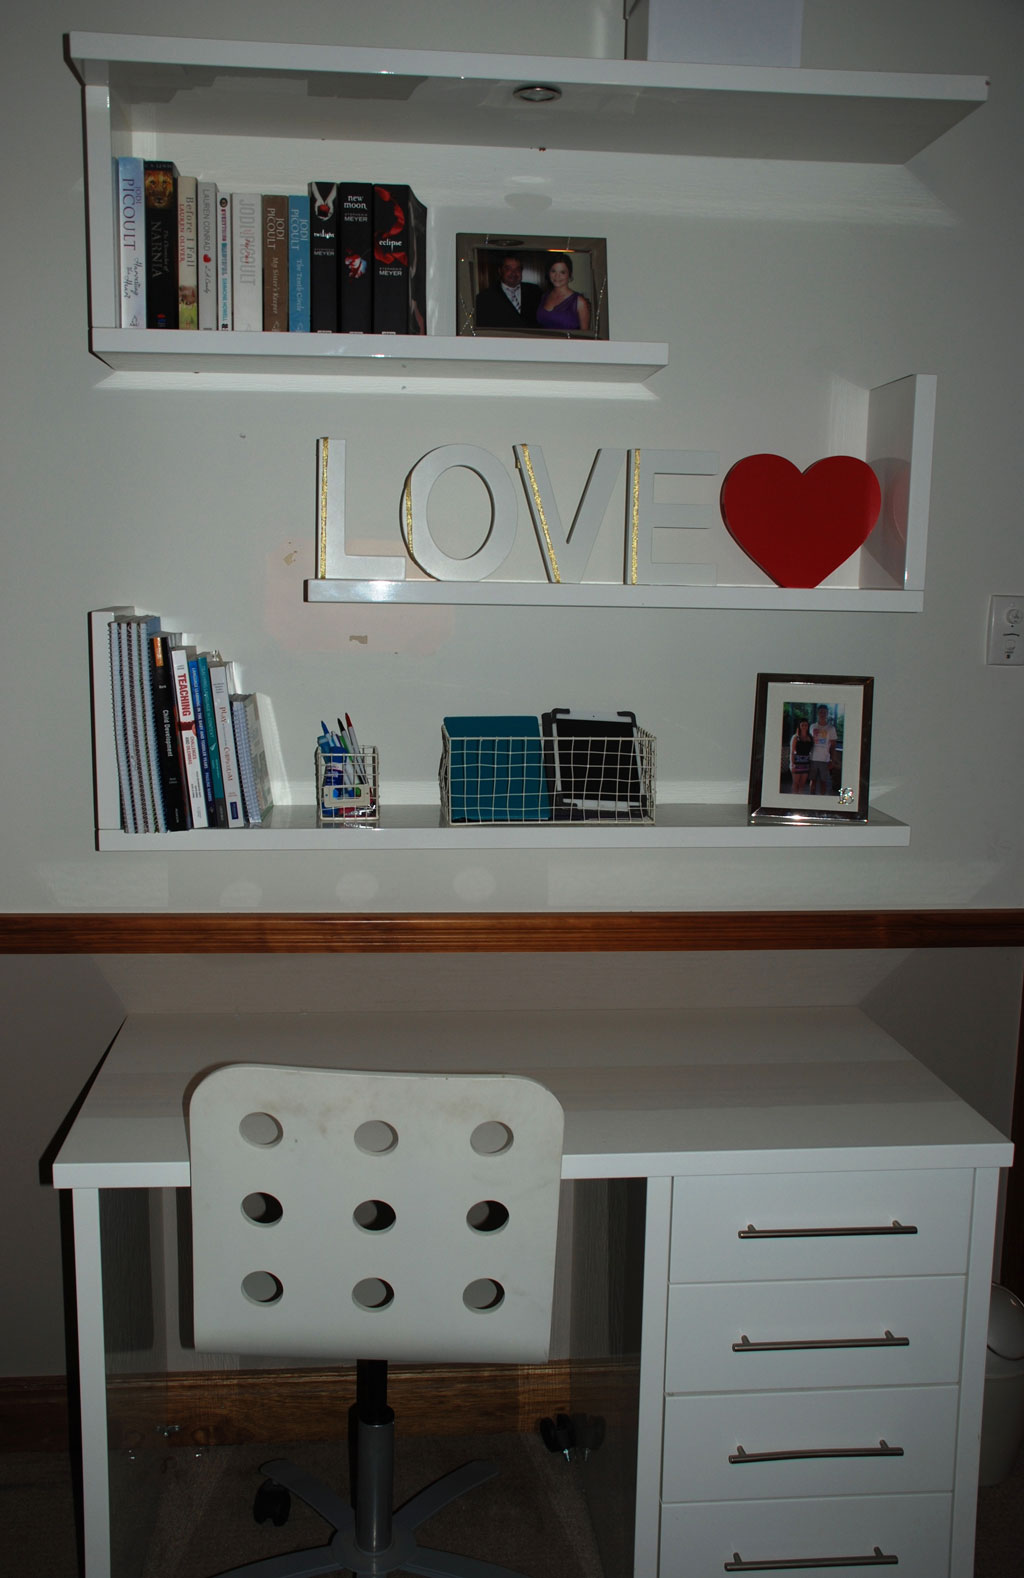 Living Room Study: Living Room Renovation, Study Desk And Shelving